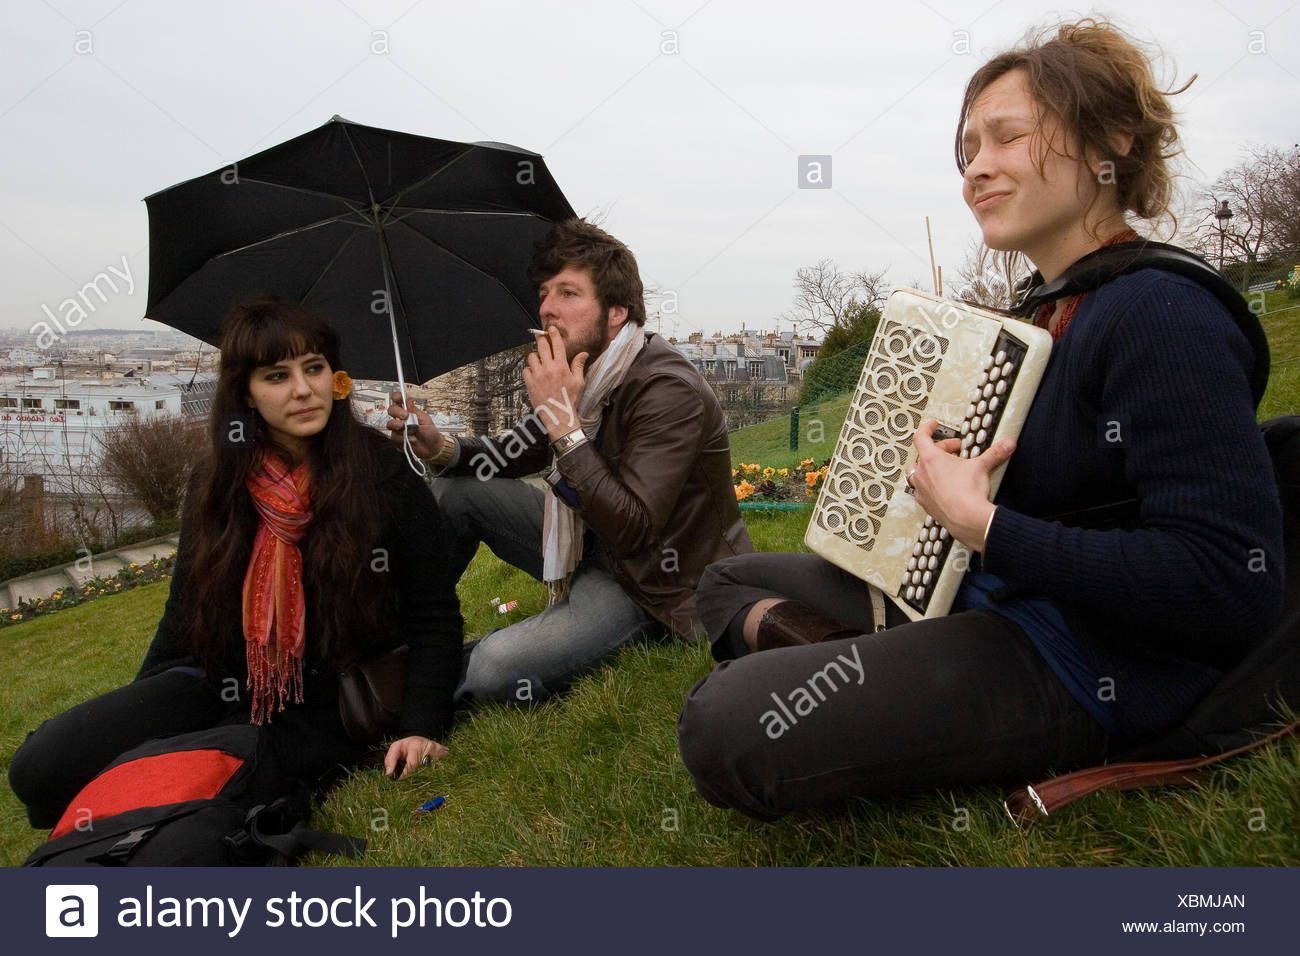 Friends meet on a lawn below Sacre Coeur. - Stock Image